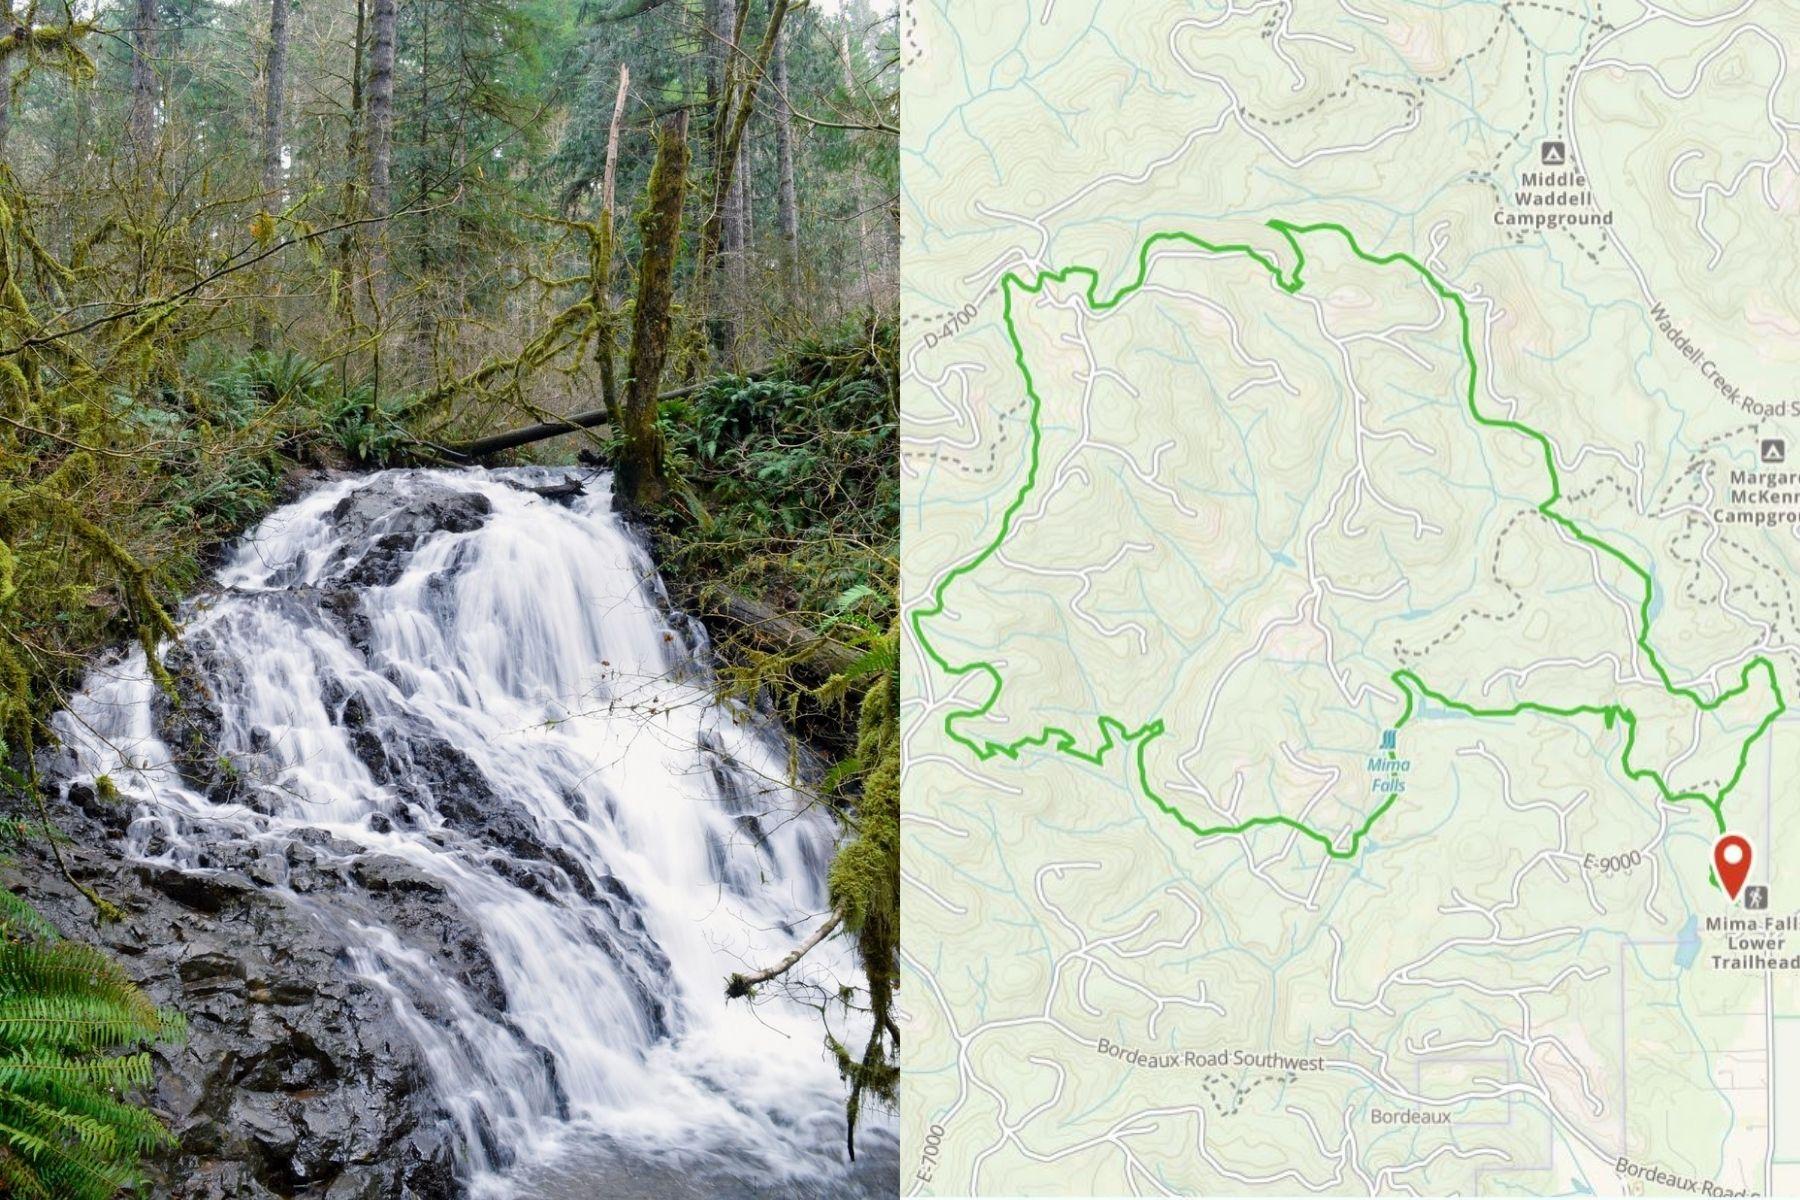 Mima Falls + McKenny Loop